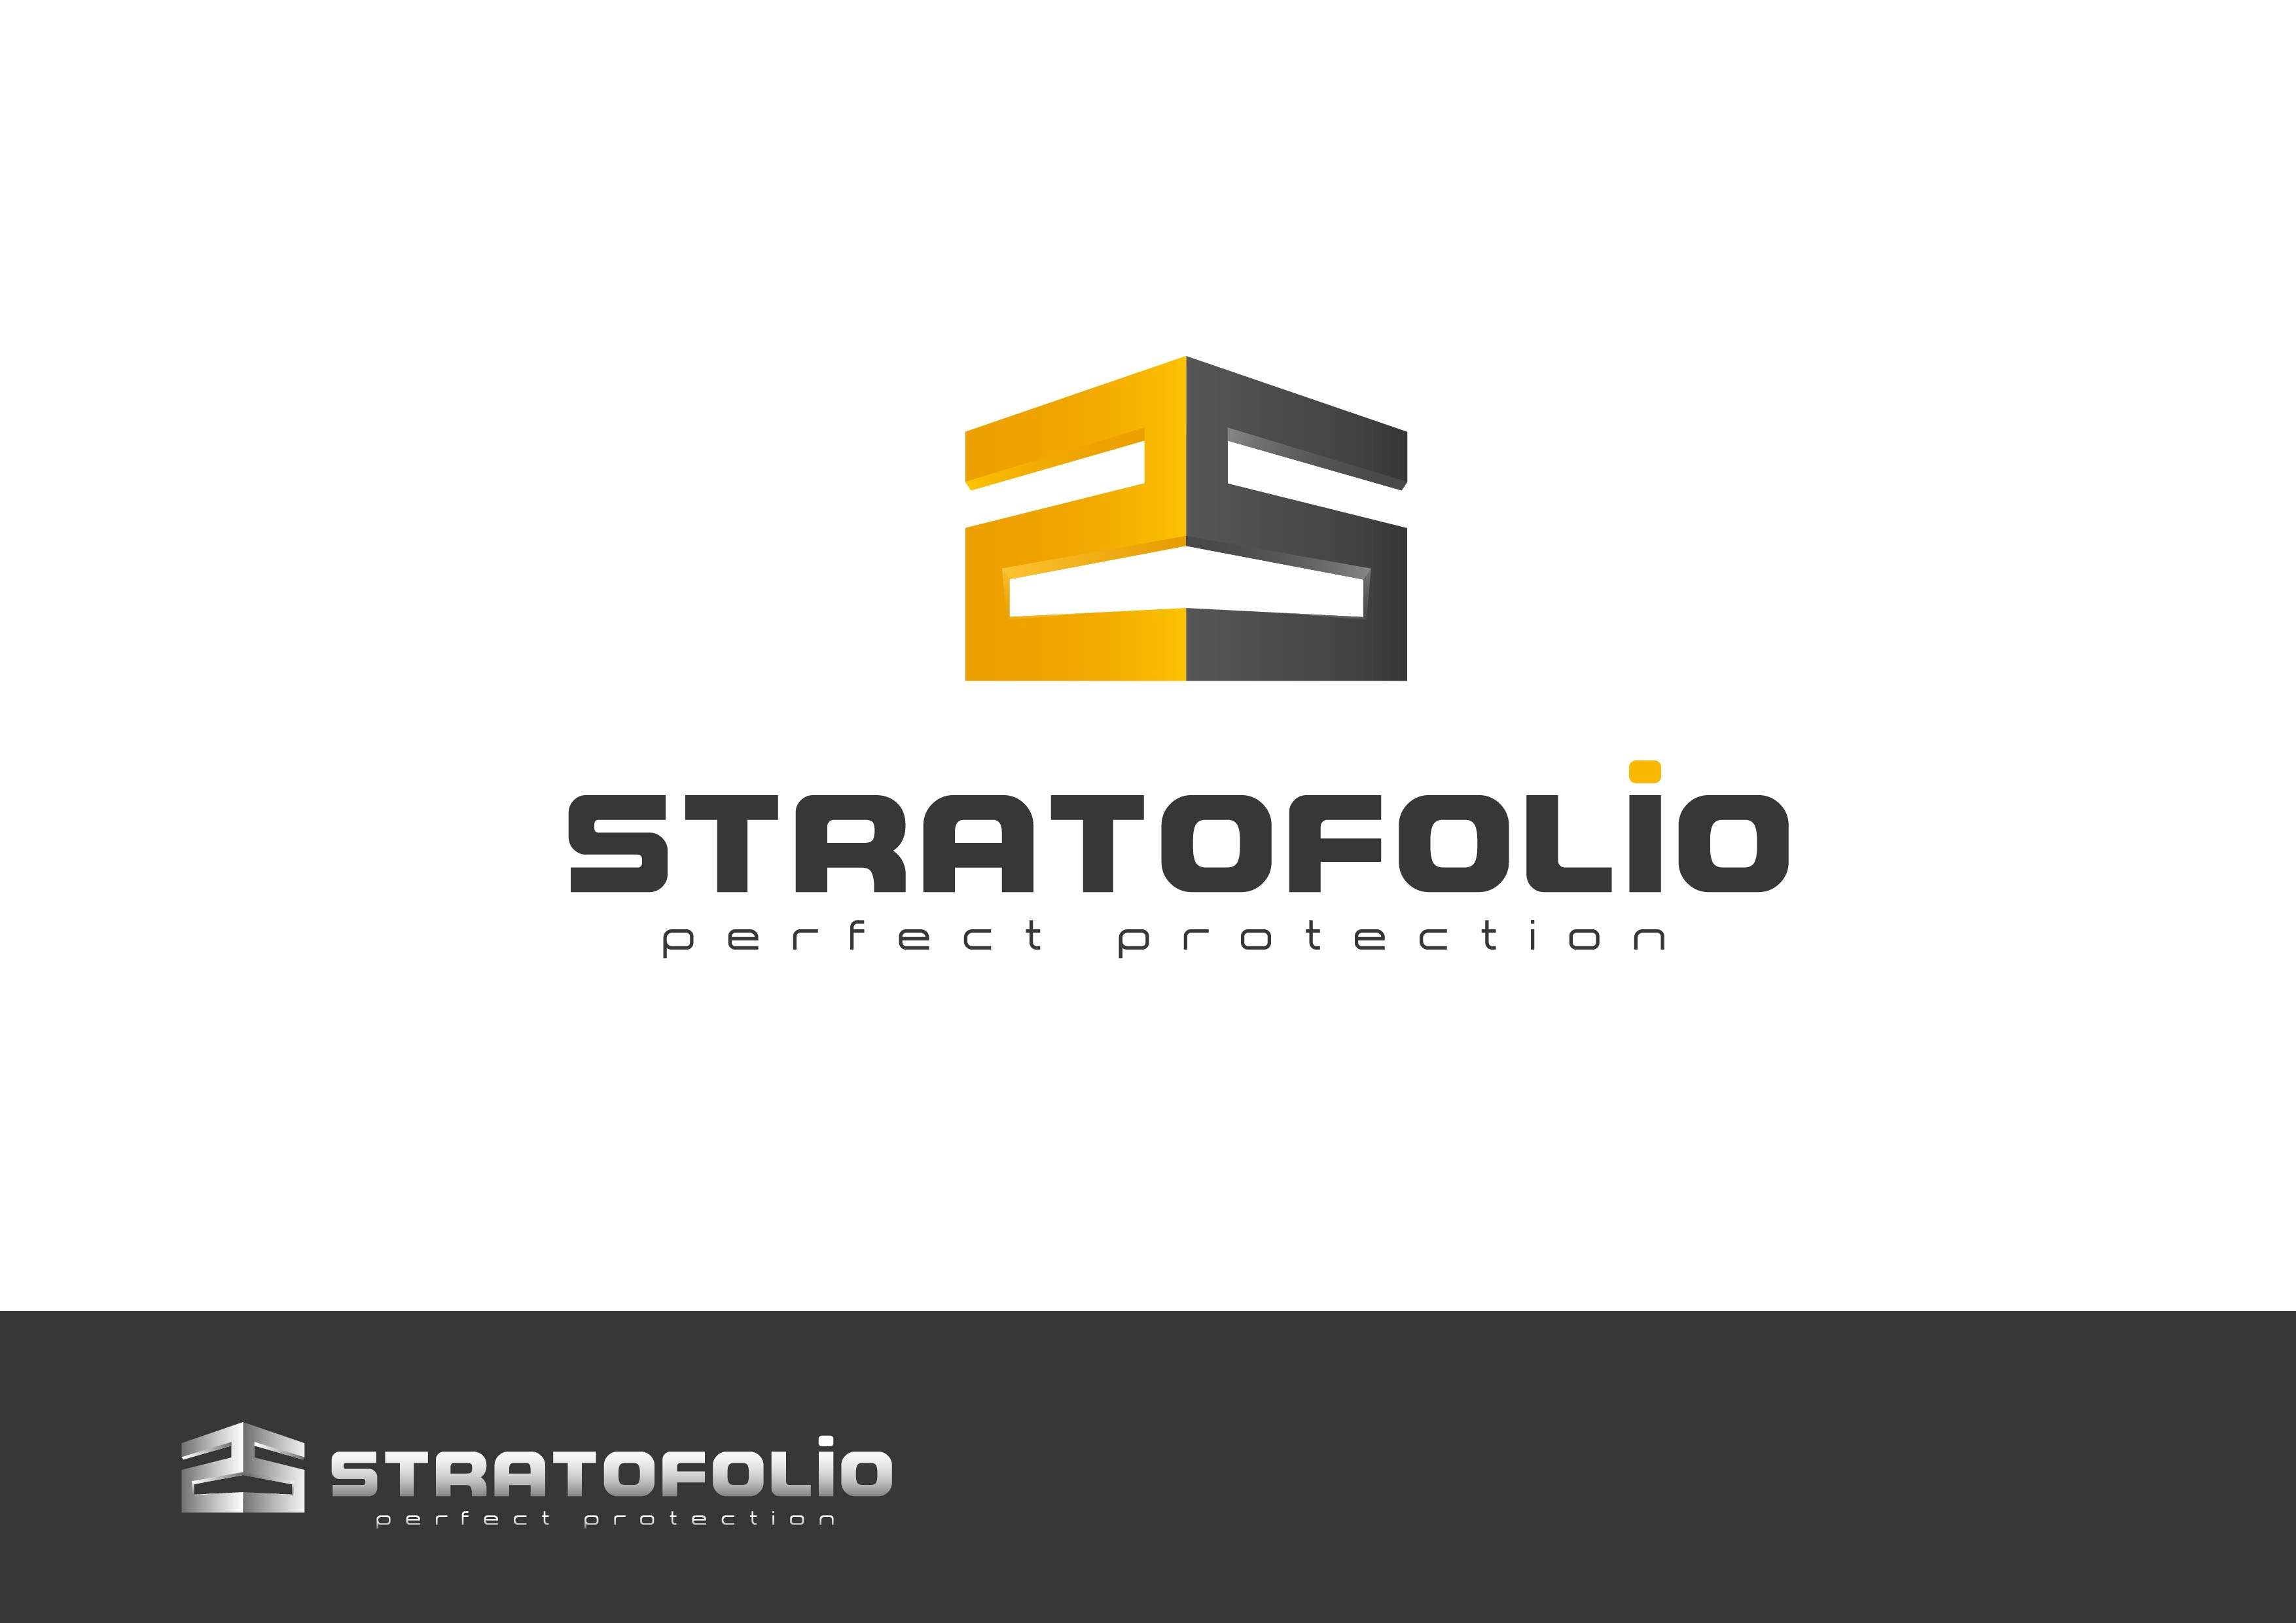 Stratofolio